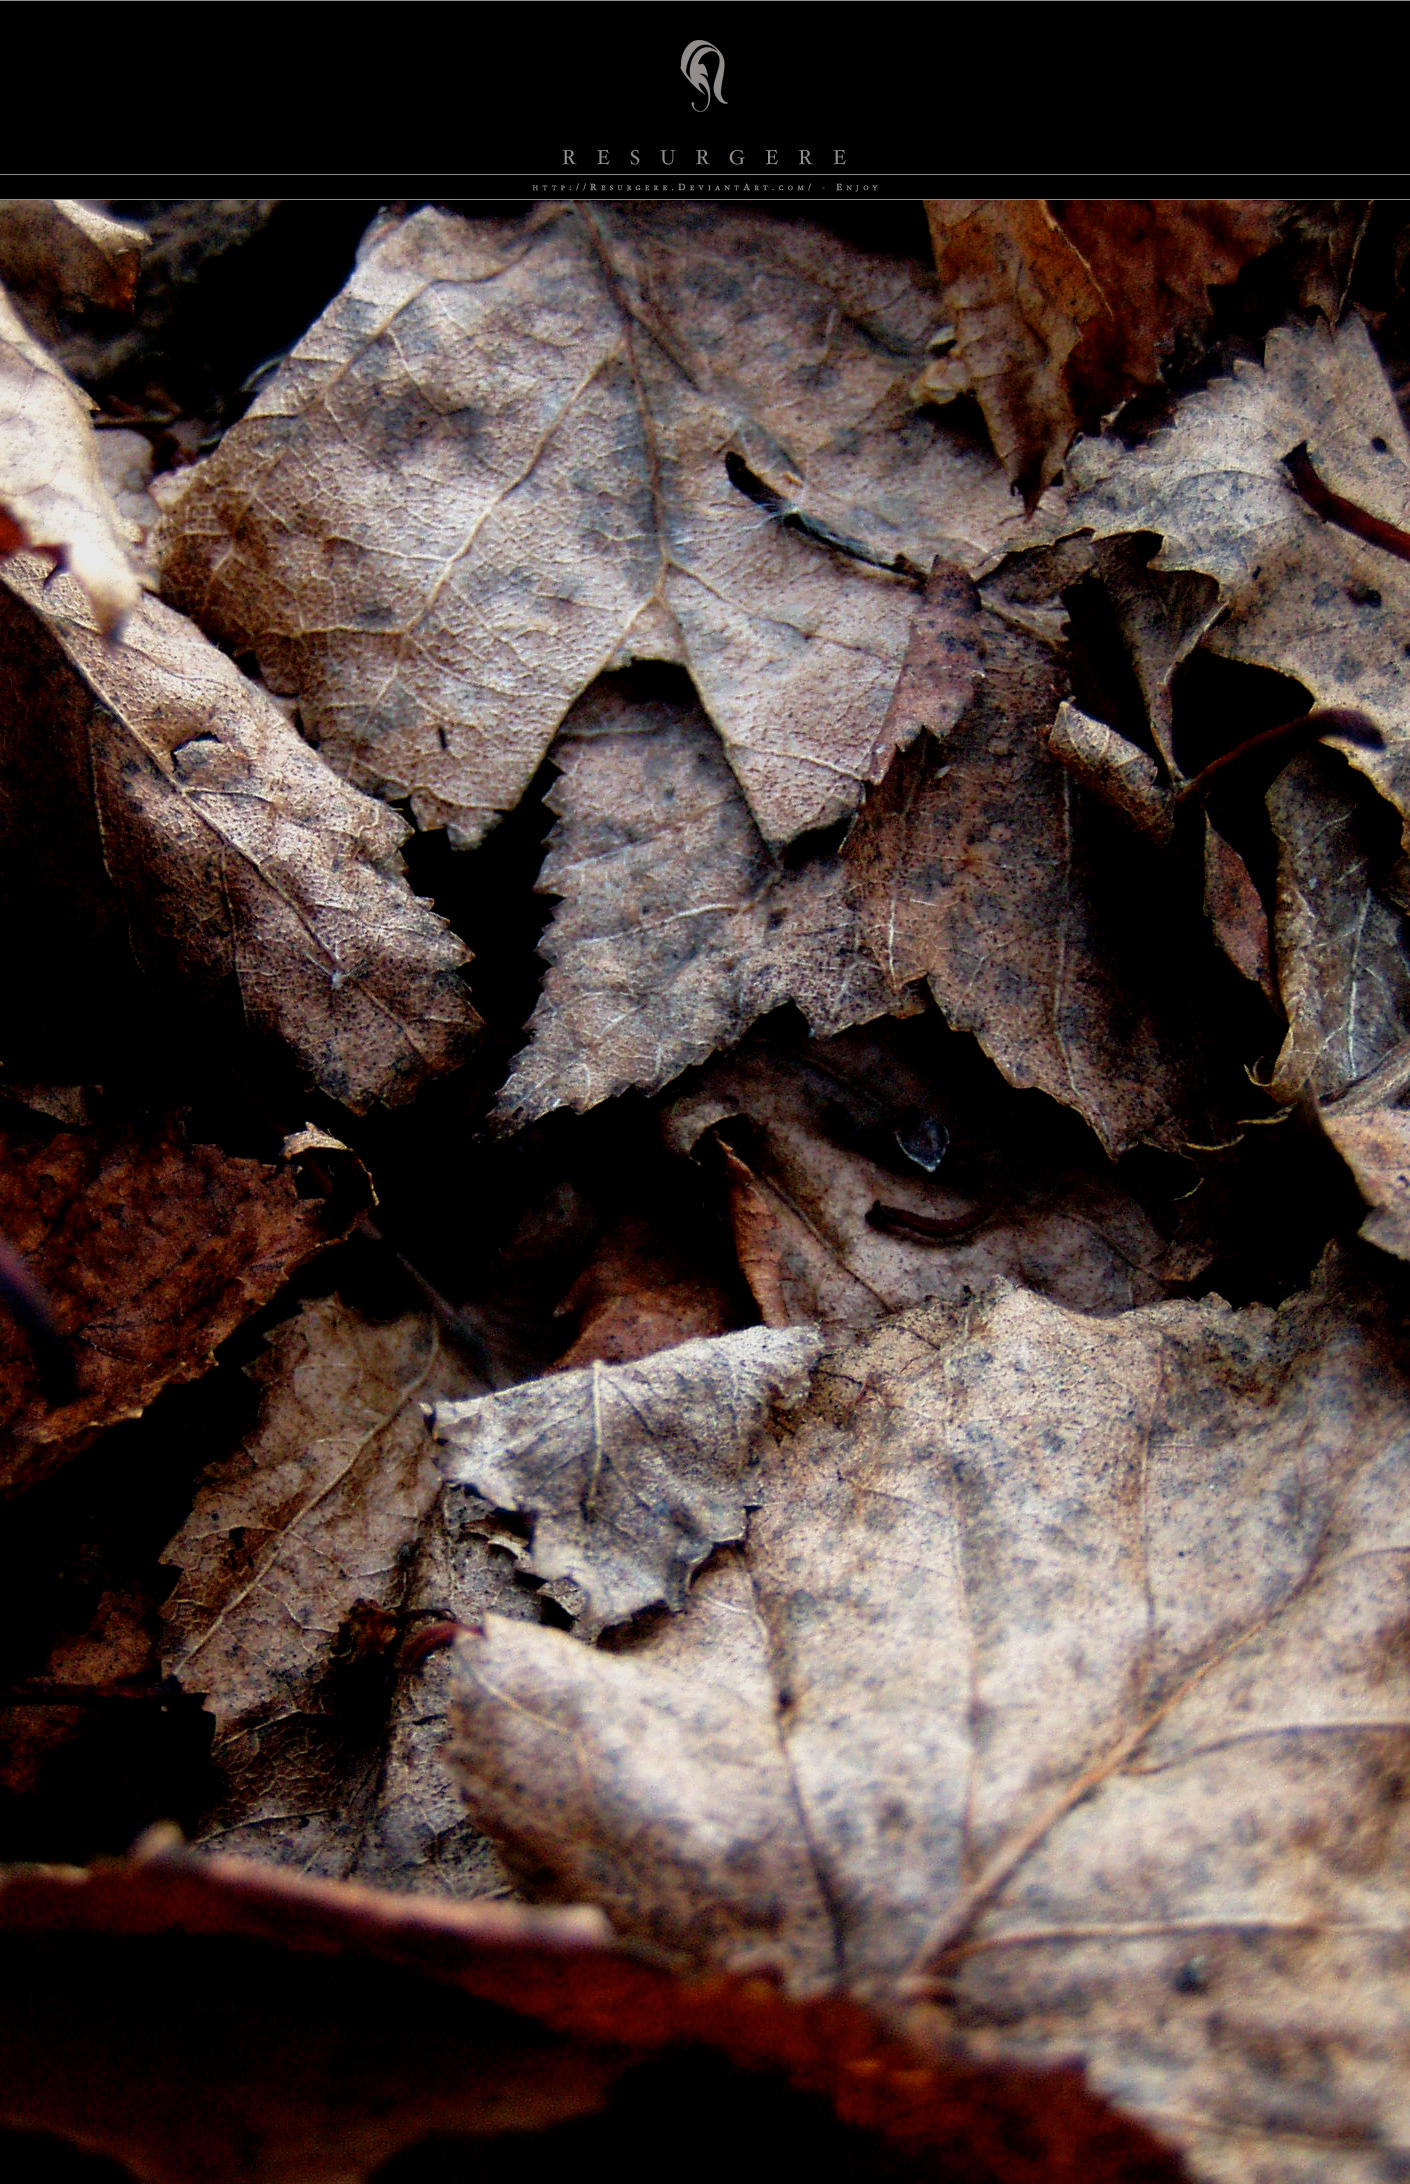 Photo - Leaf - 4859 by resurgere